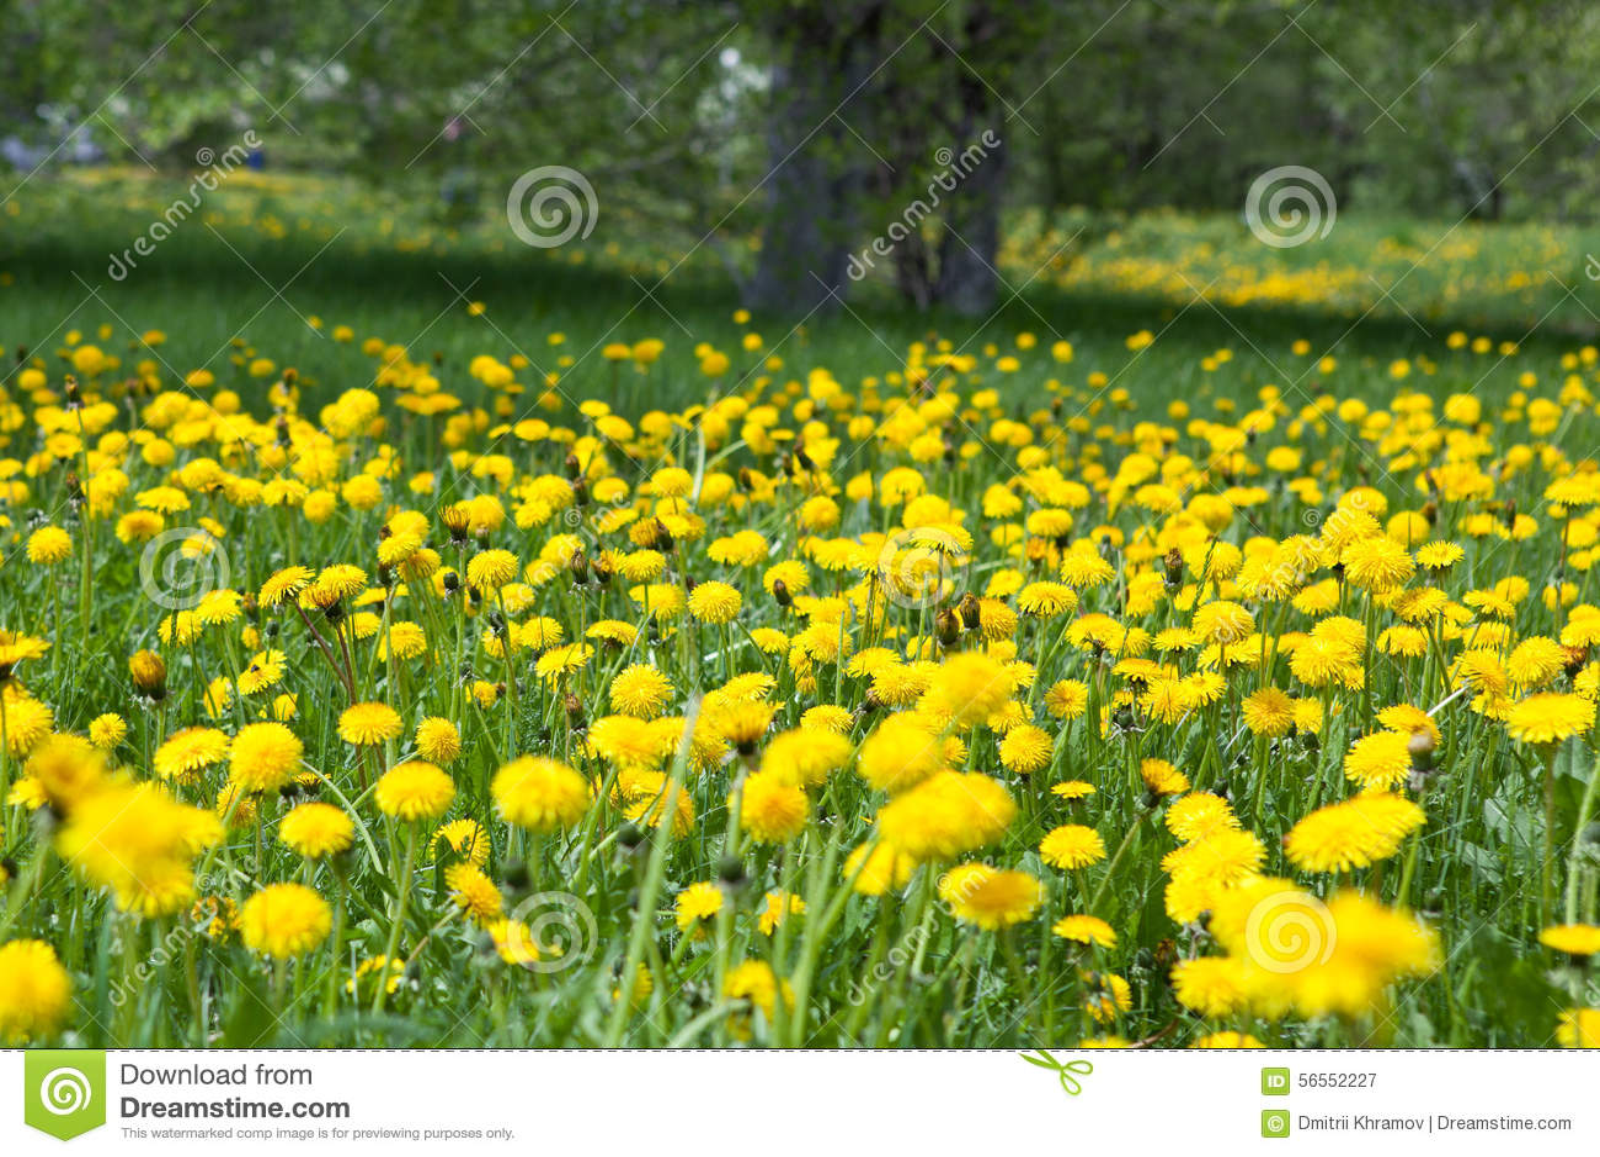 Download Πικραλίδα μεταξύ των λουλουδιών Στοκ Εικόνα - εικόνα από ήλιος, χλόη: 56552227